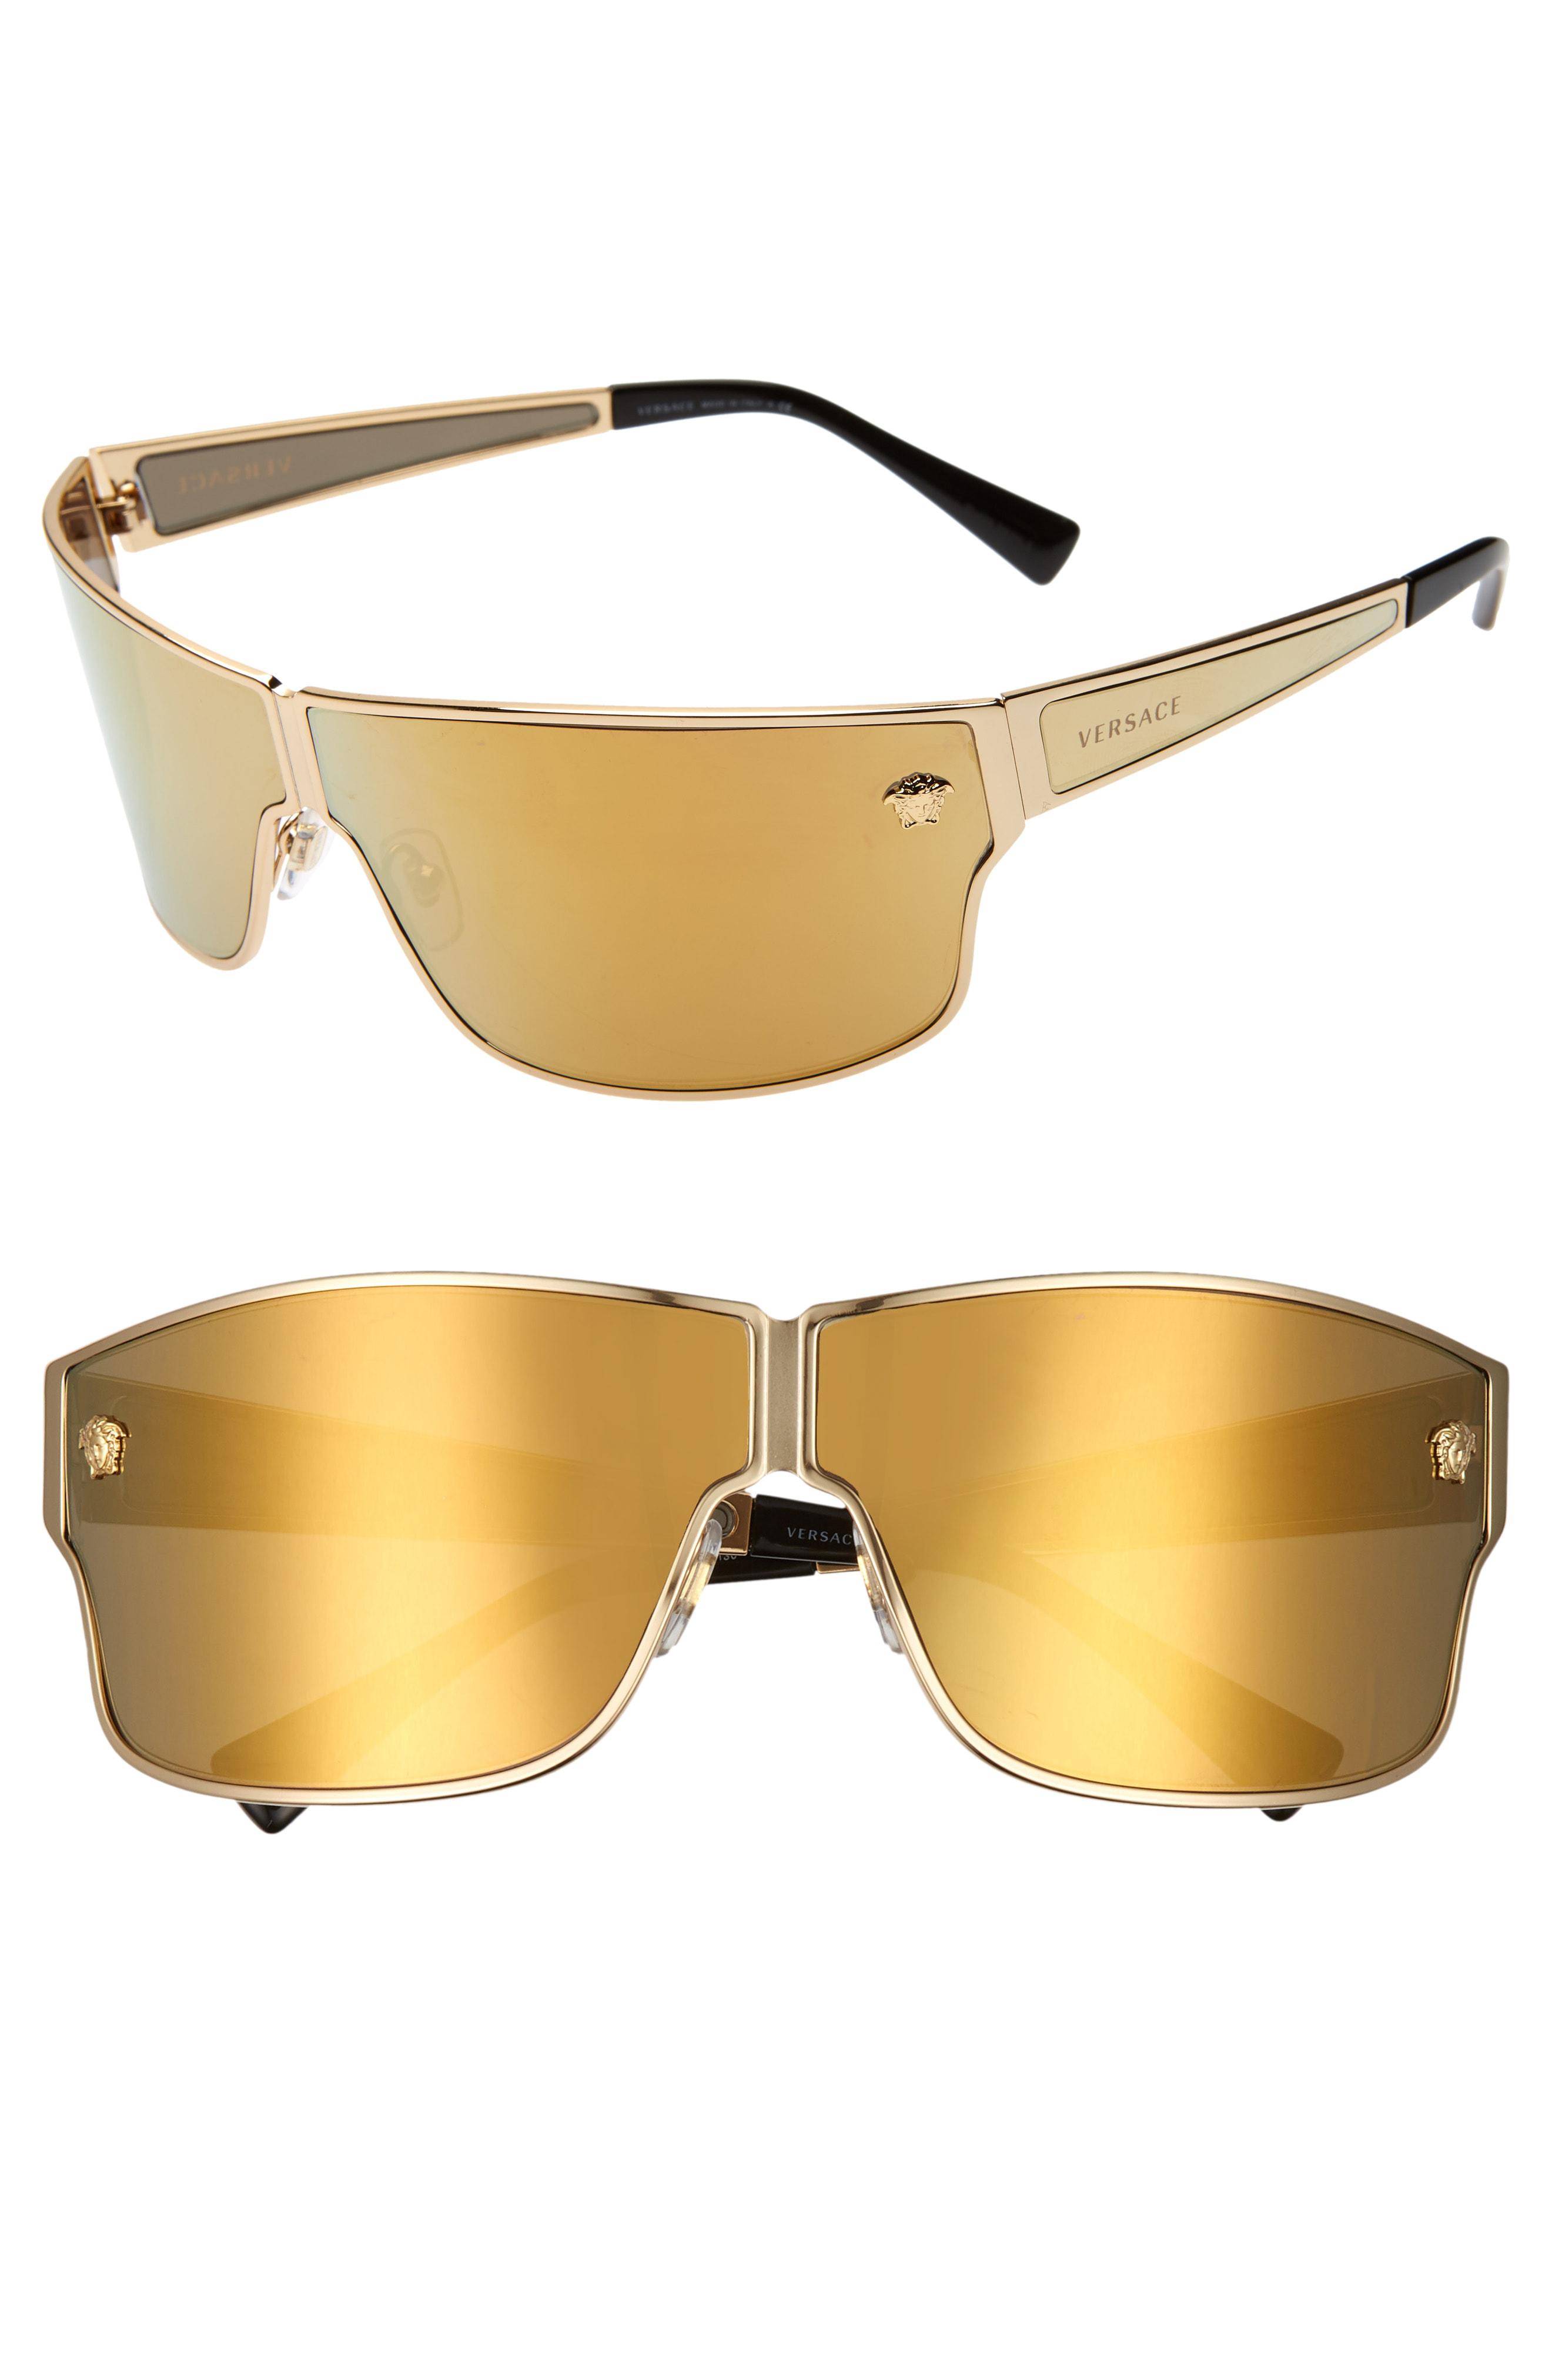 275c189f8007 Versace Medusa 72Mm Mirrored Shield Sunglasses - Gold/ Gold Mirror ...